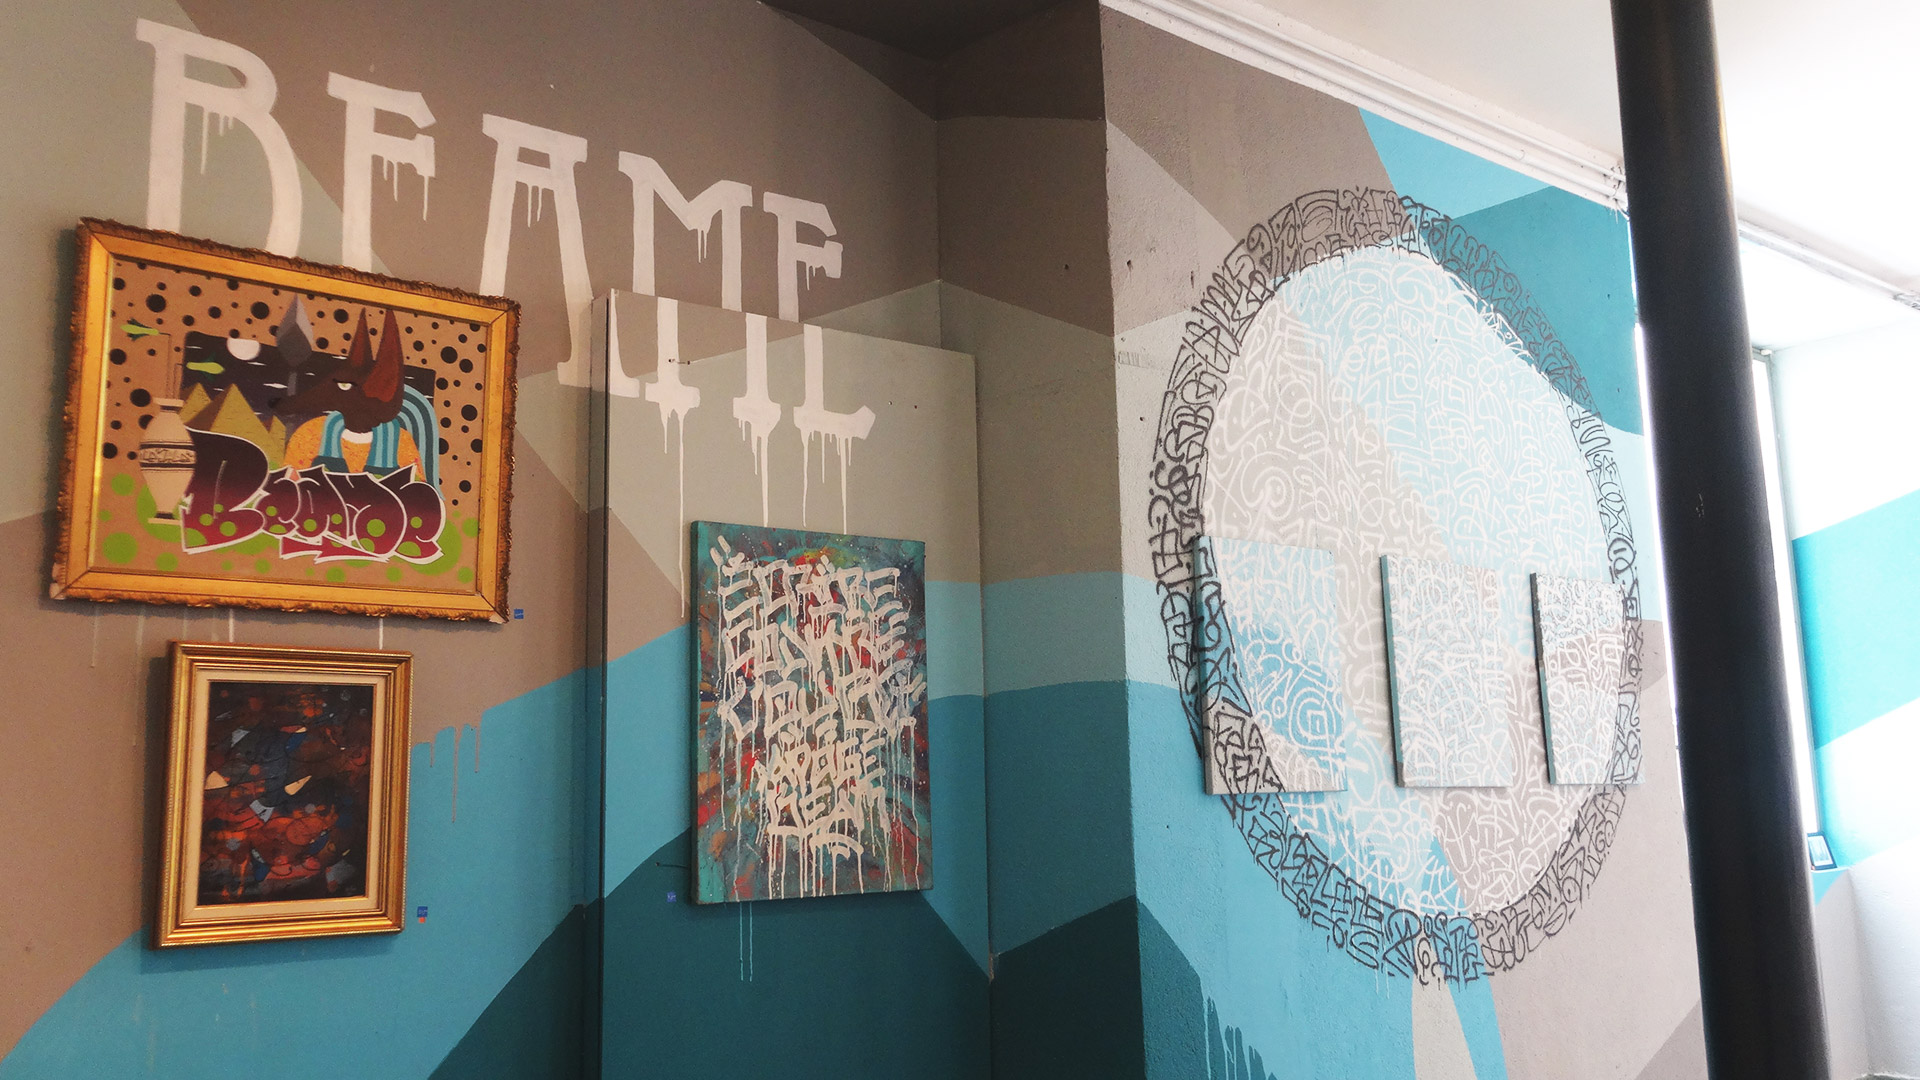 Beame 414 - Exposition ENDtoEND - Street-Art - Rue Savaron Clermont-Ferrand